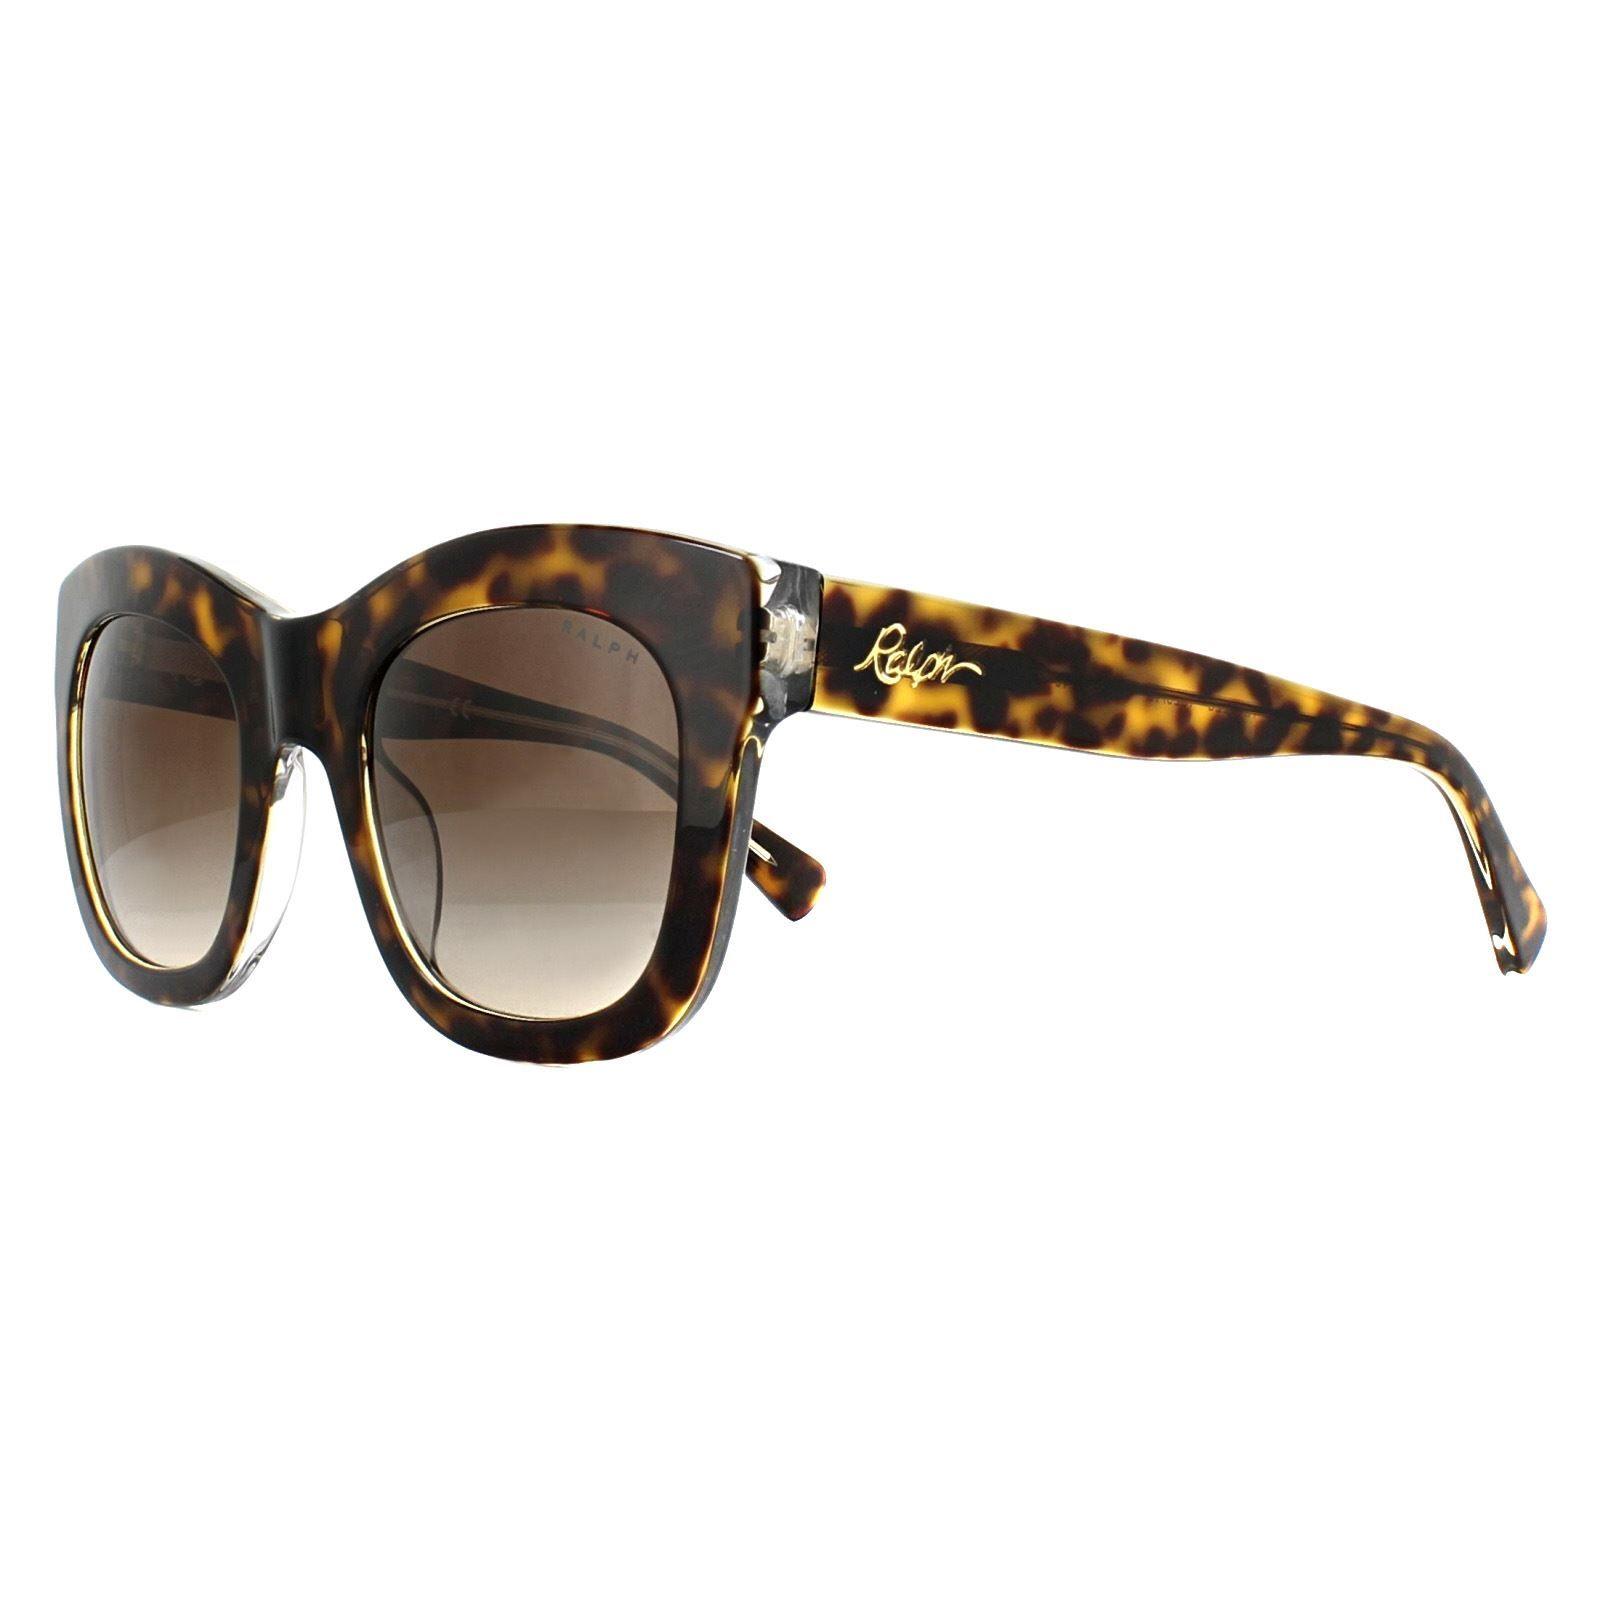 Ralph by Ralph Lauren Sunglasses RA5225 162913 Tortoise Crystal Brown Gradient